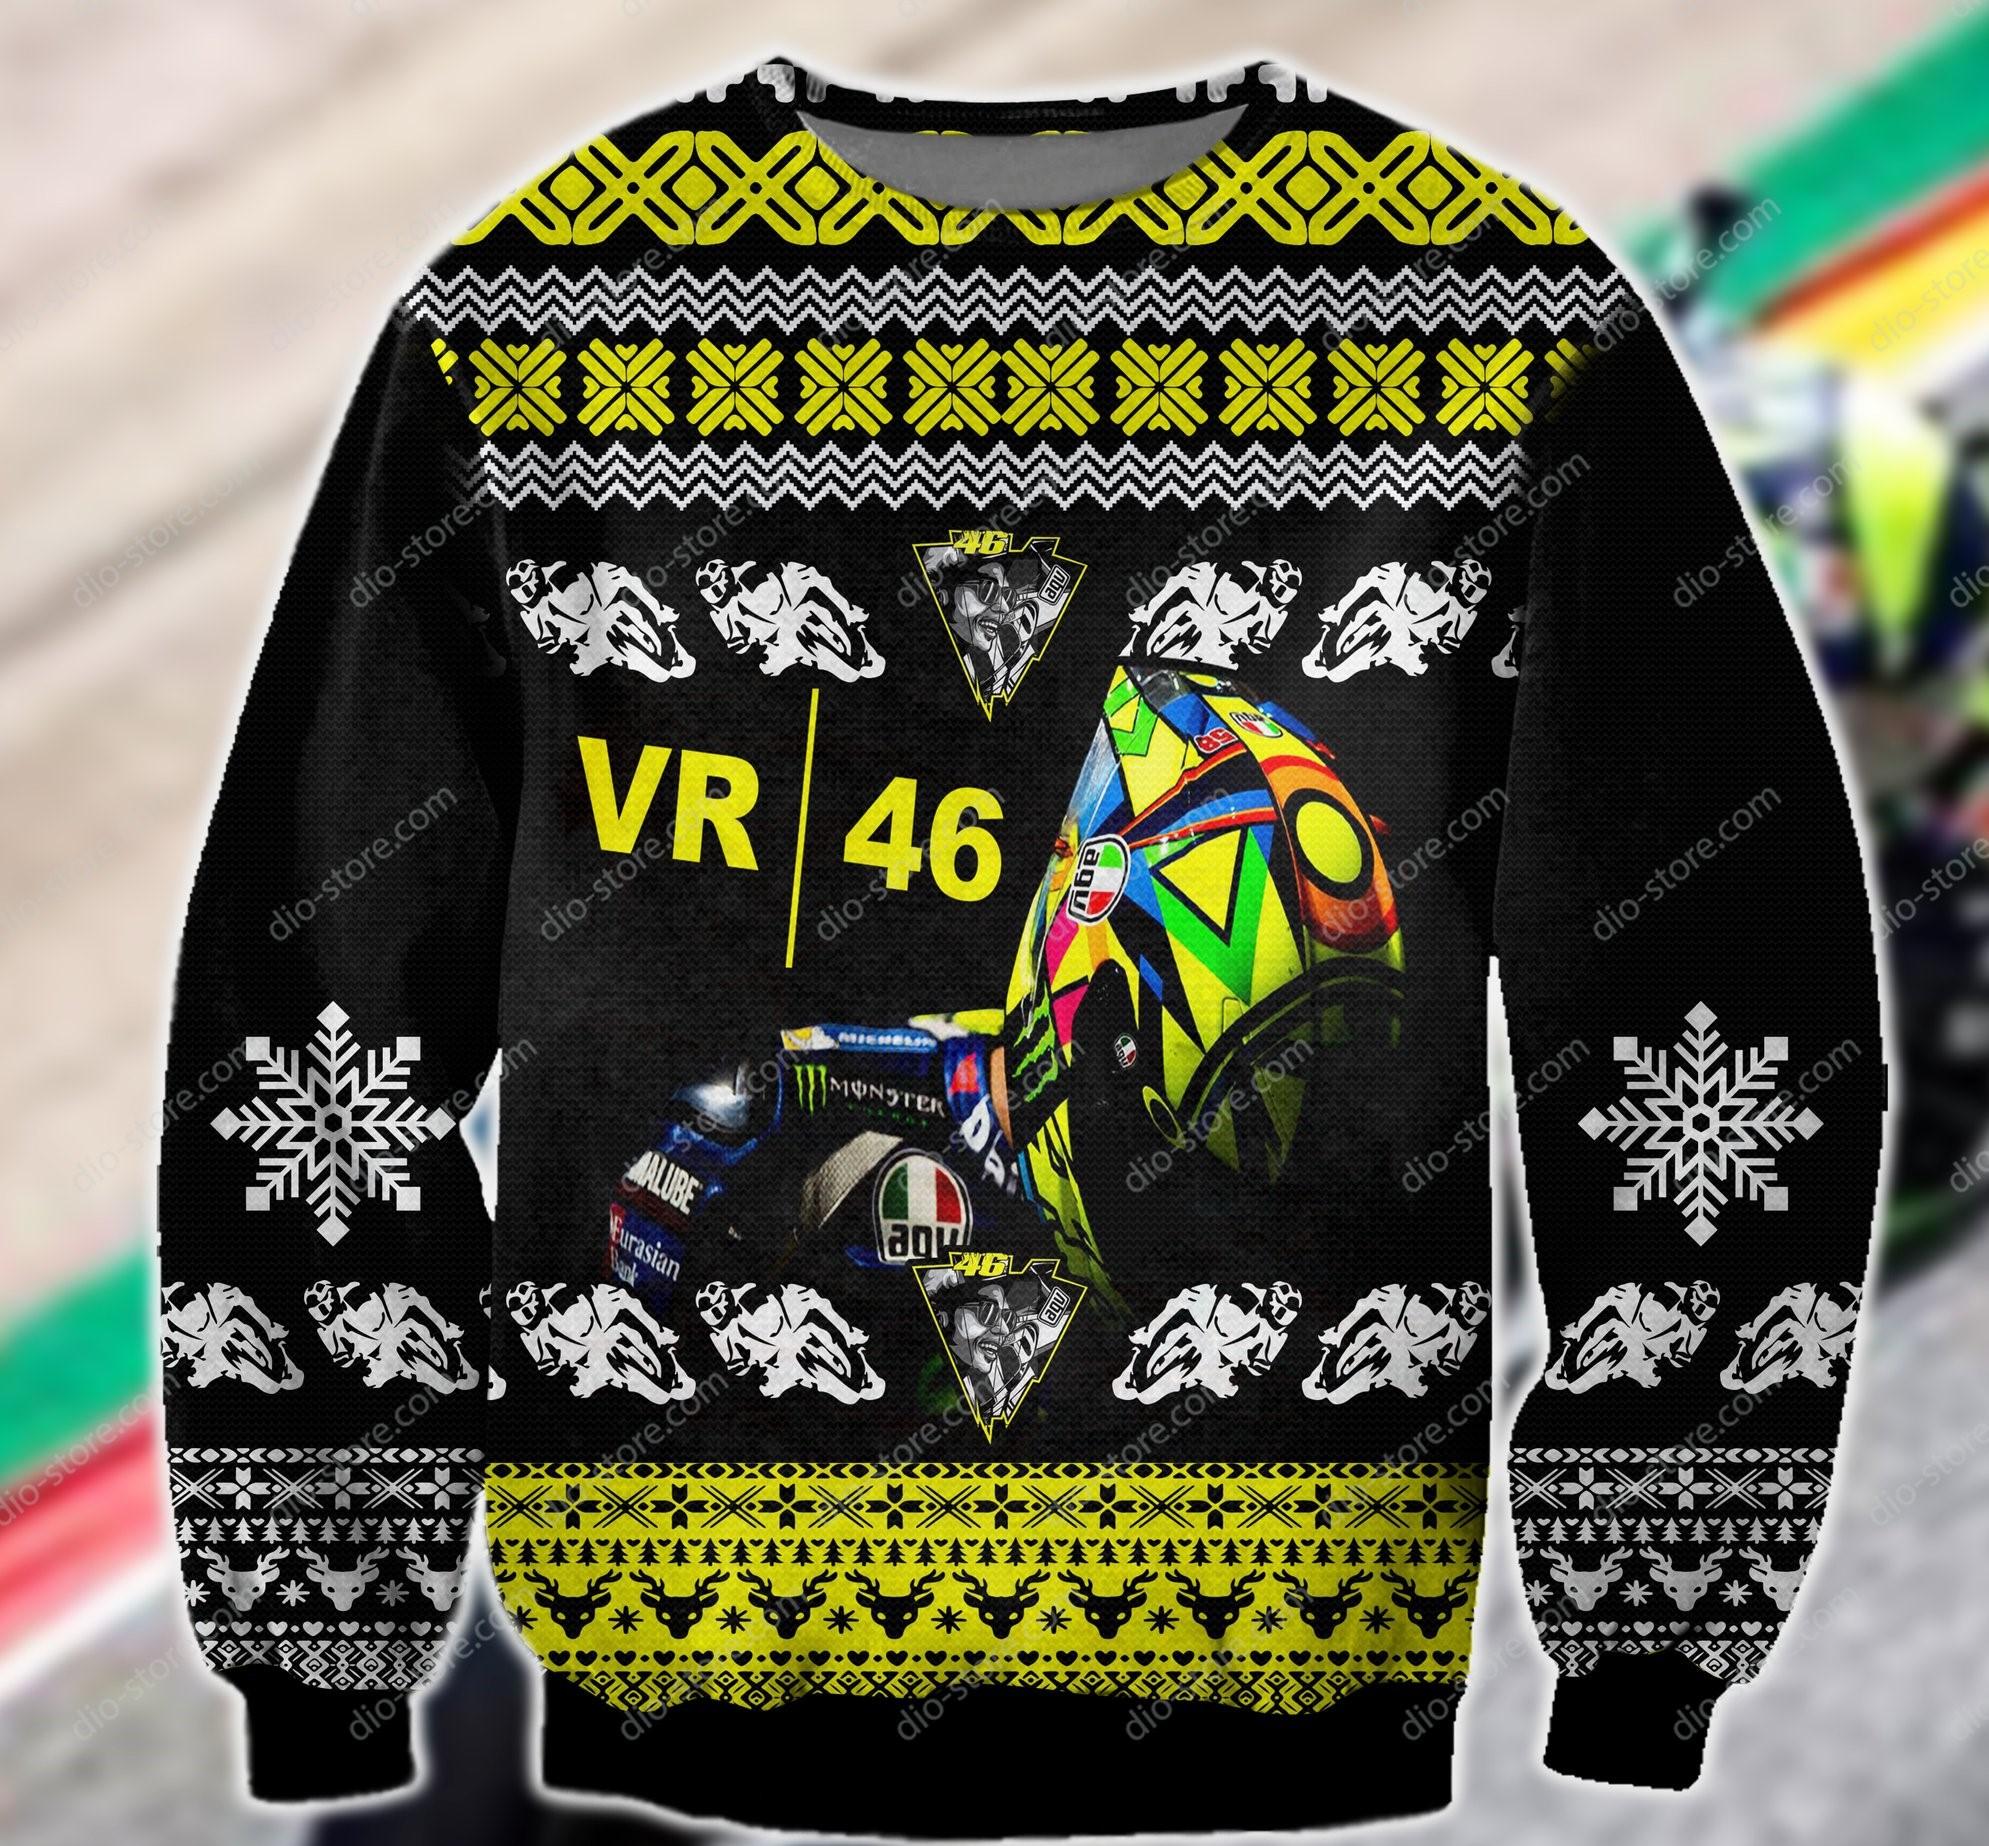 sky racing vr46 all over printed ugly christmas sweater 2